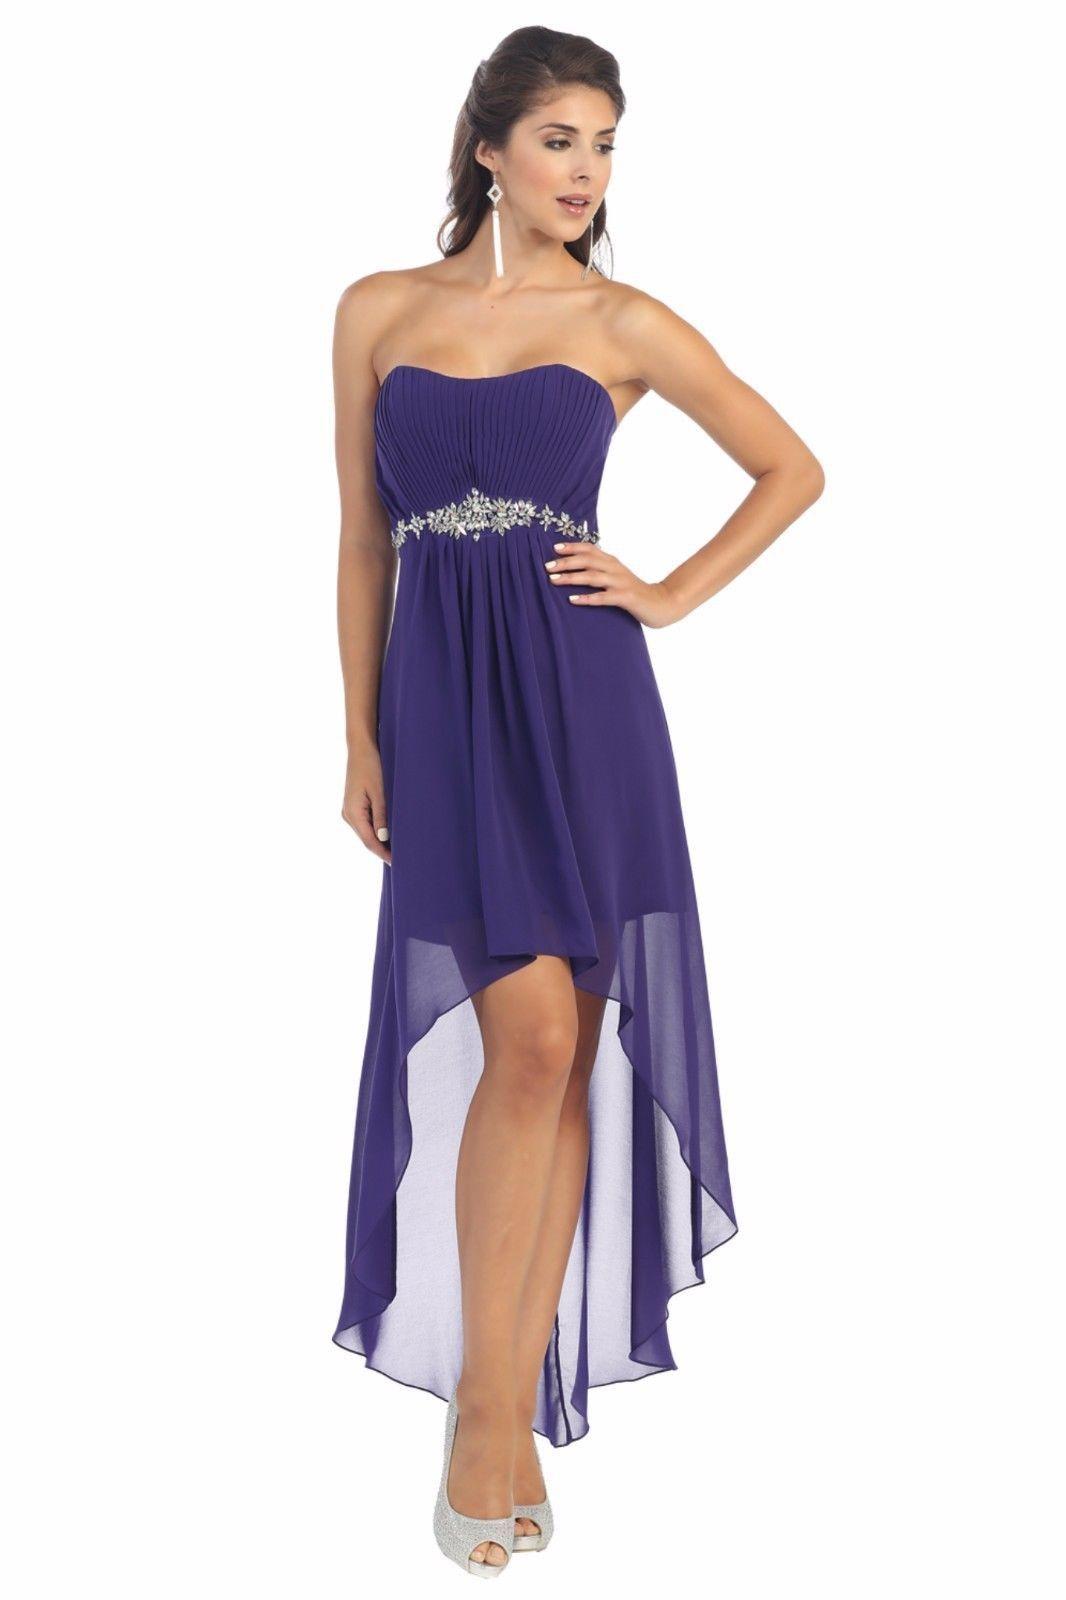 High Low Formal Bridesmaids Plus Size Prom Dress 2018 | dresses ...